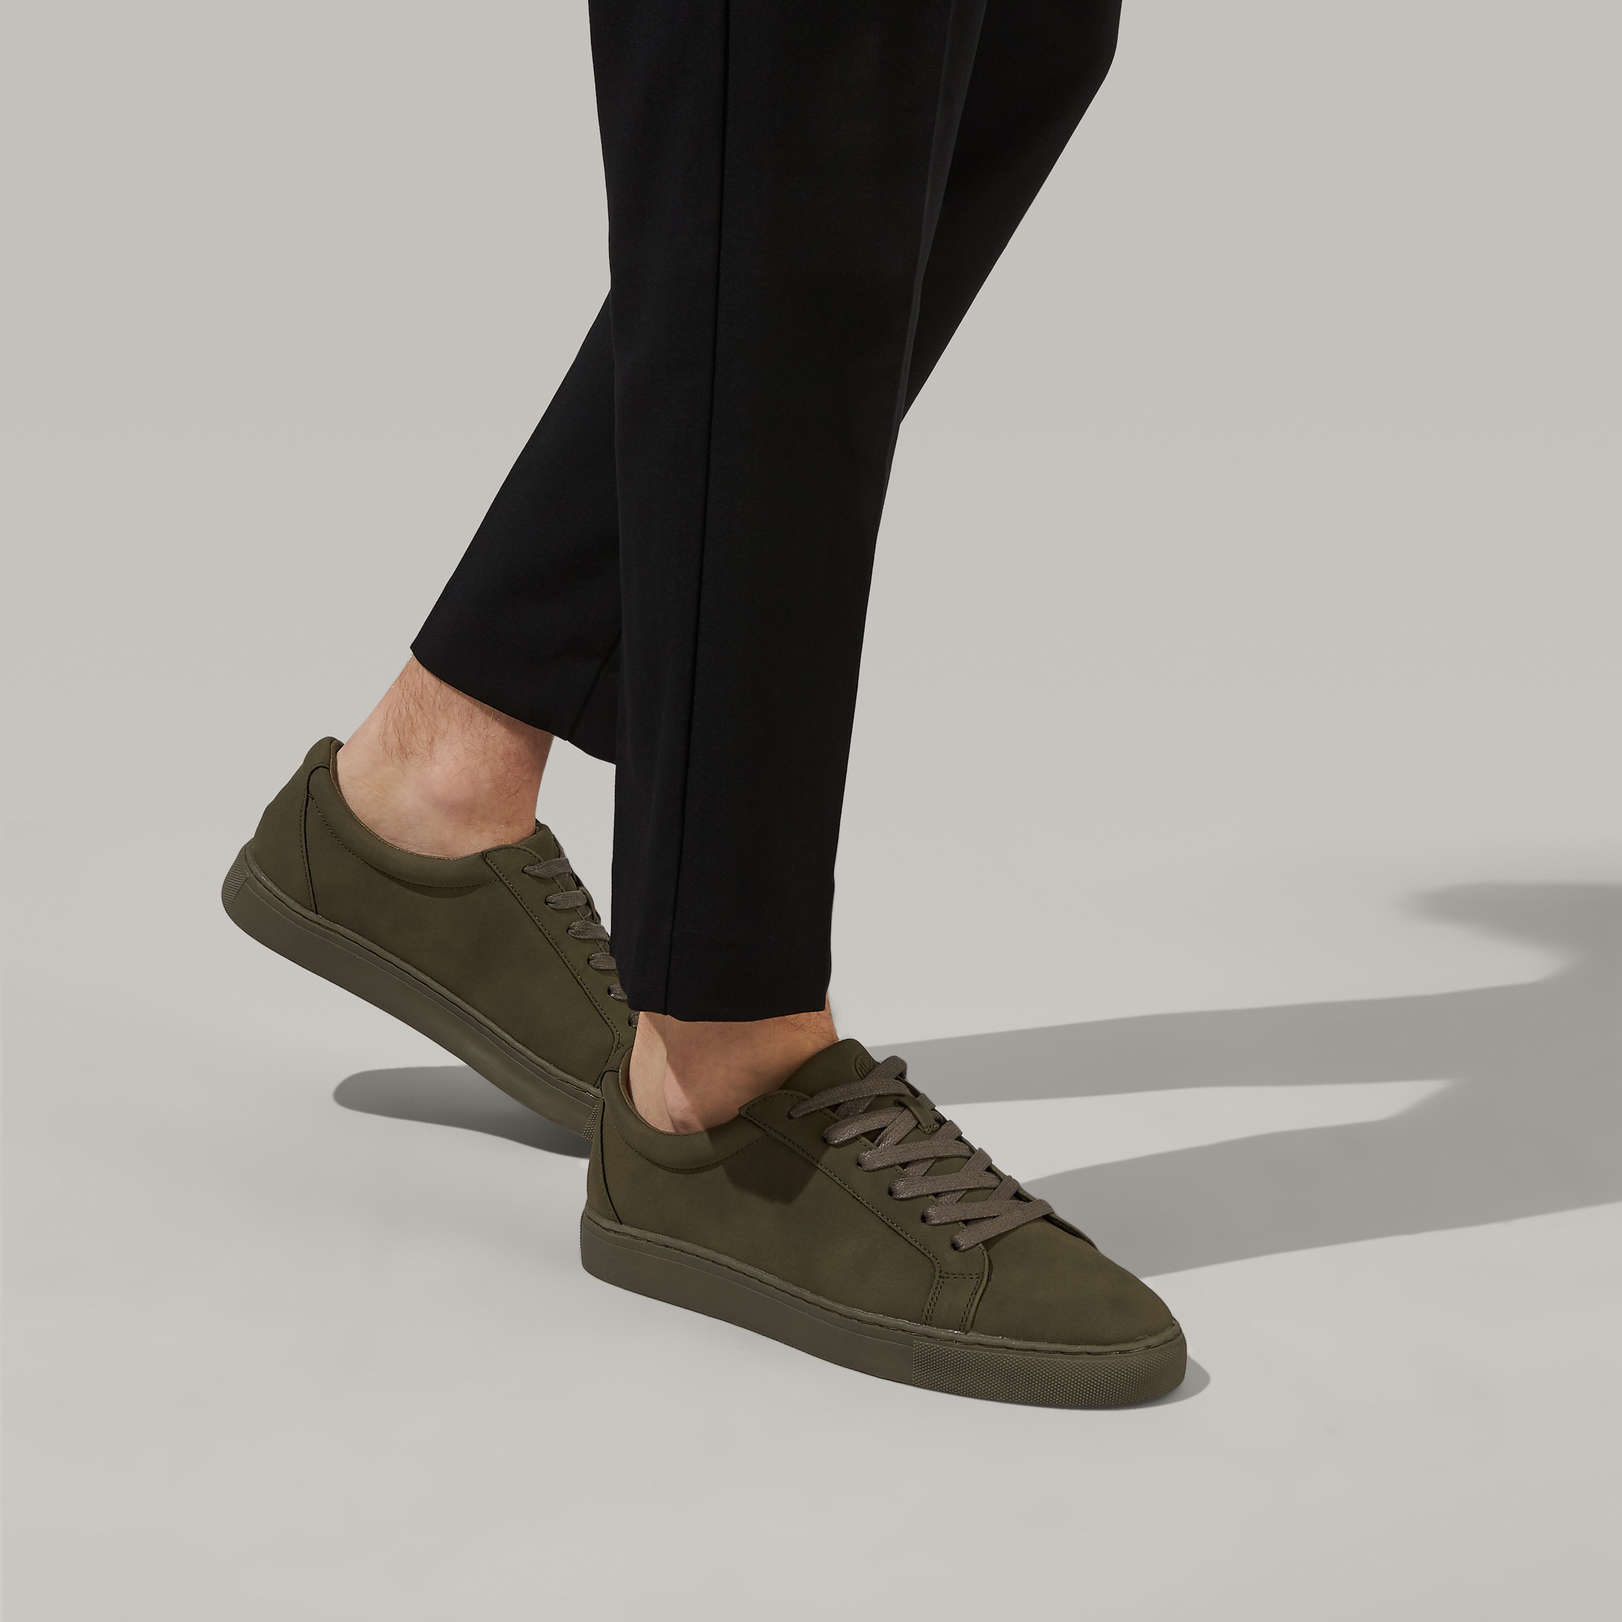 WHITWORTH - KG KURT GEIGER Sneakers